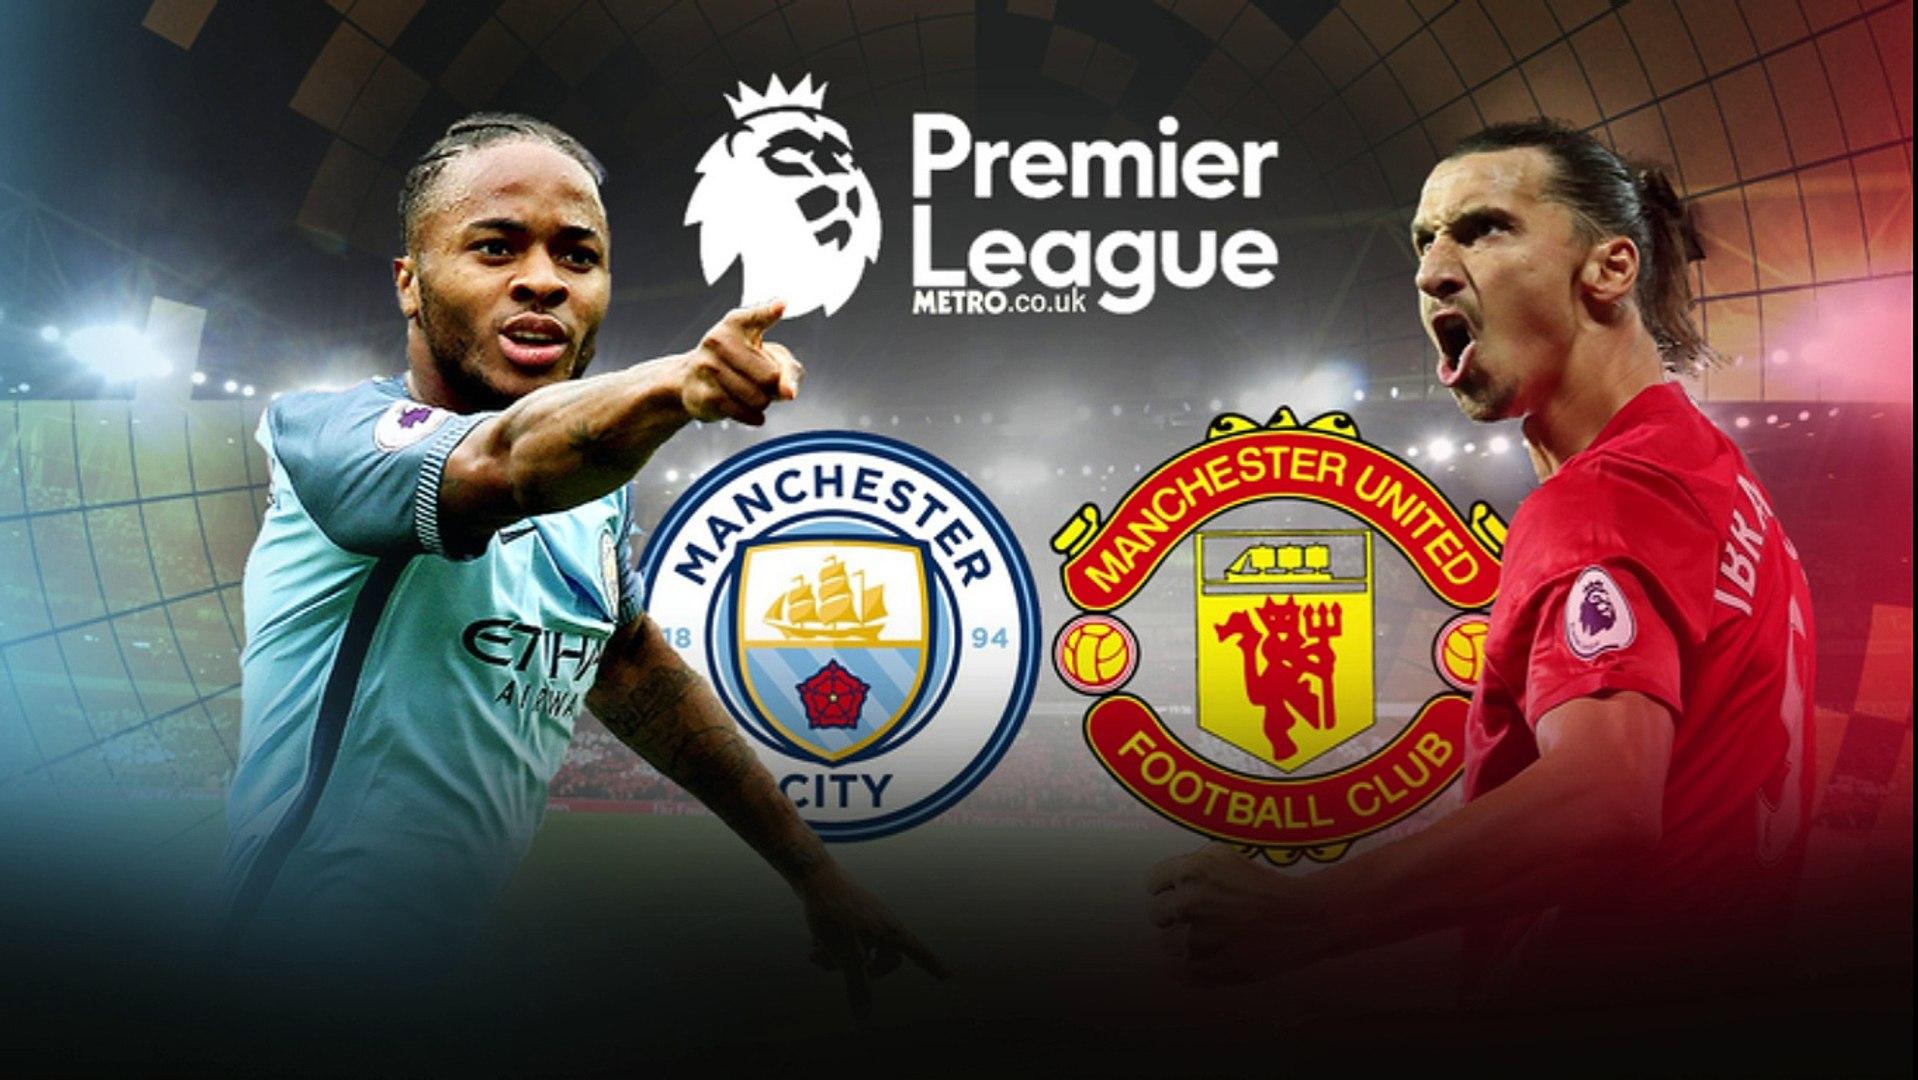 Manchester City vs Manchester United England - Premier League  Vmrk Tv